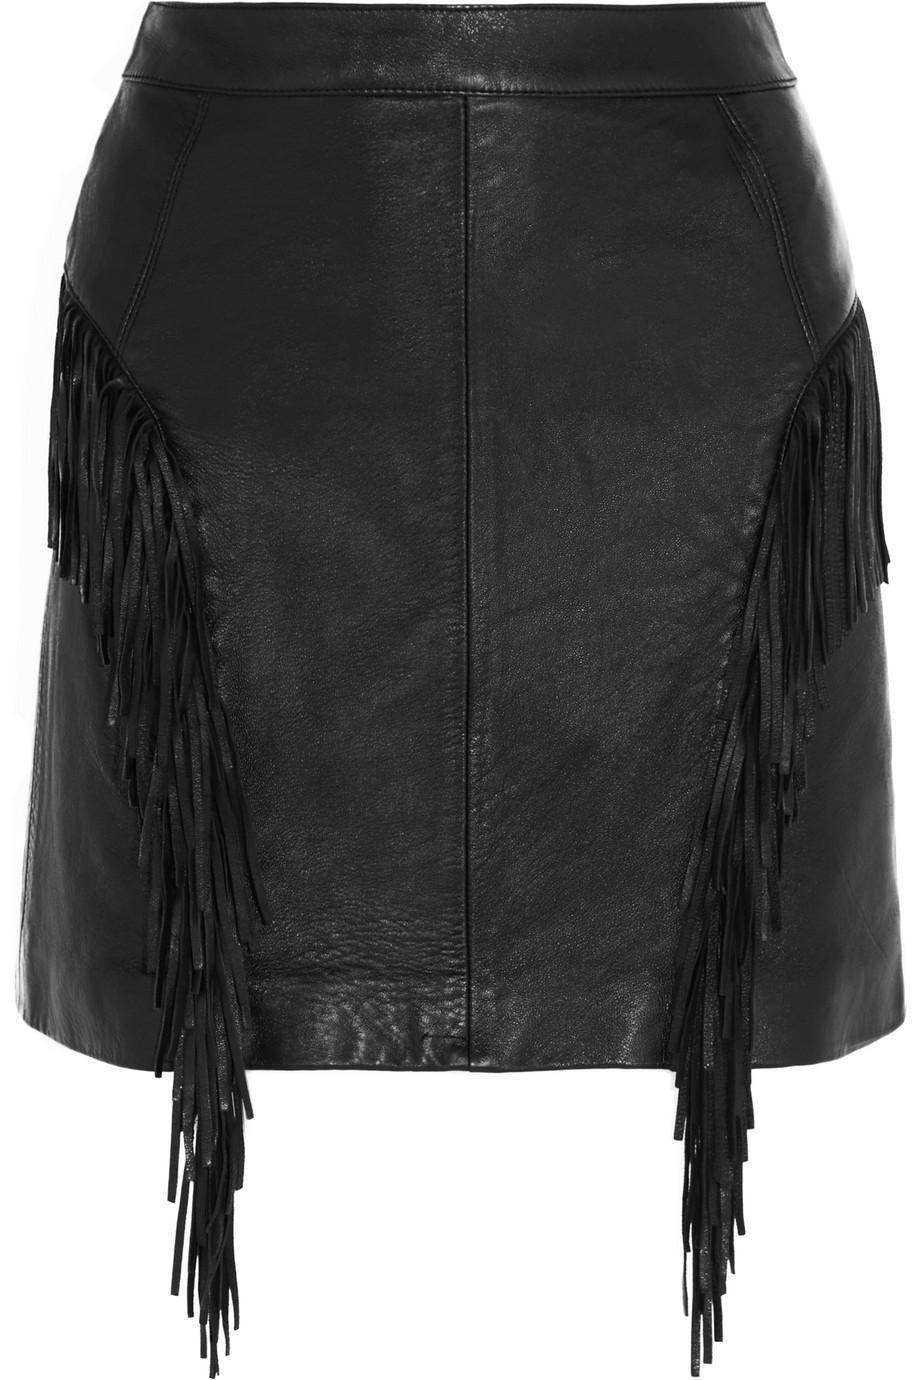 Saint Laurent Fringed Leather Mini Skirt, Black, Women's, Size: 34